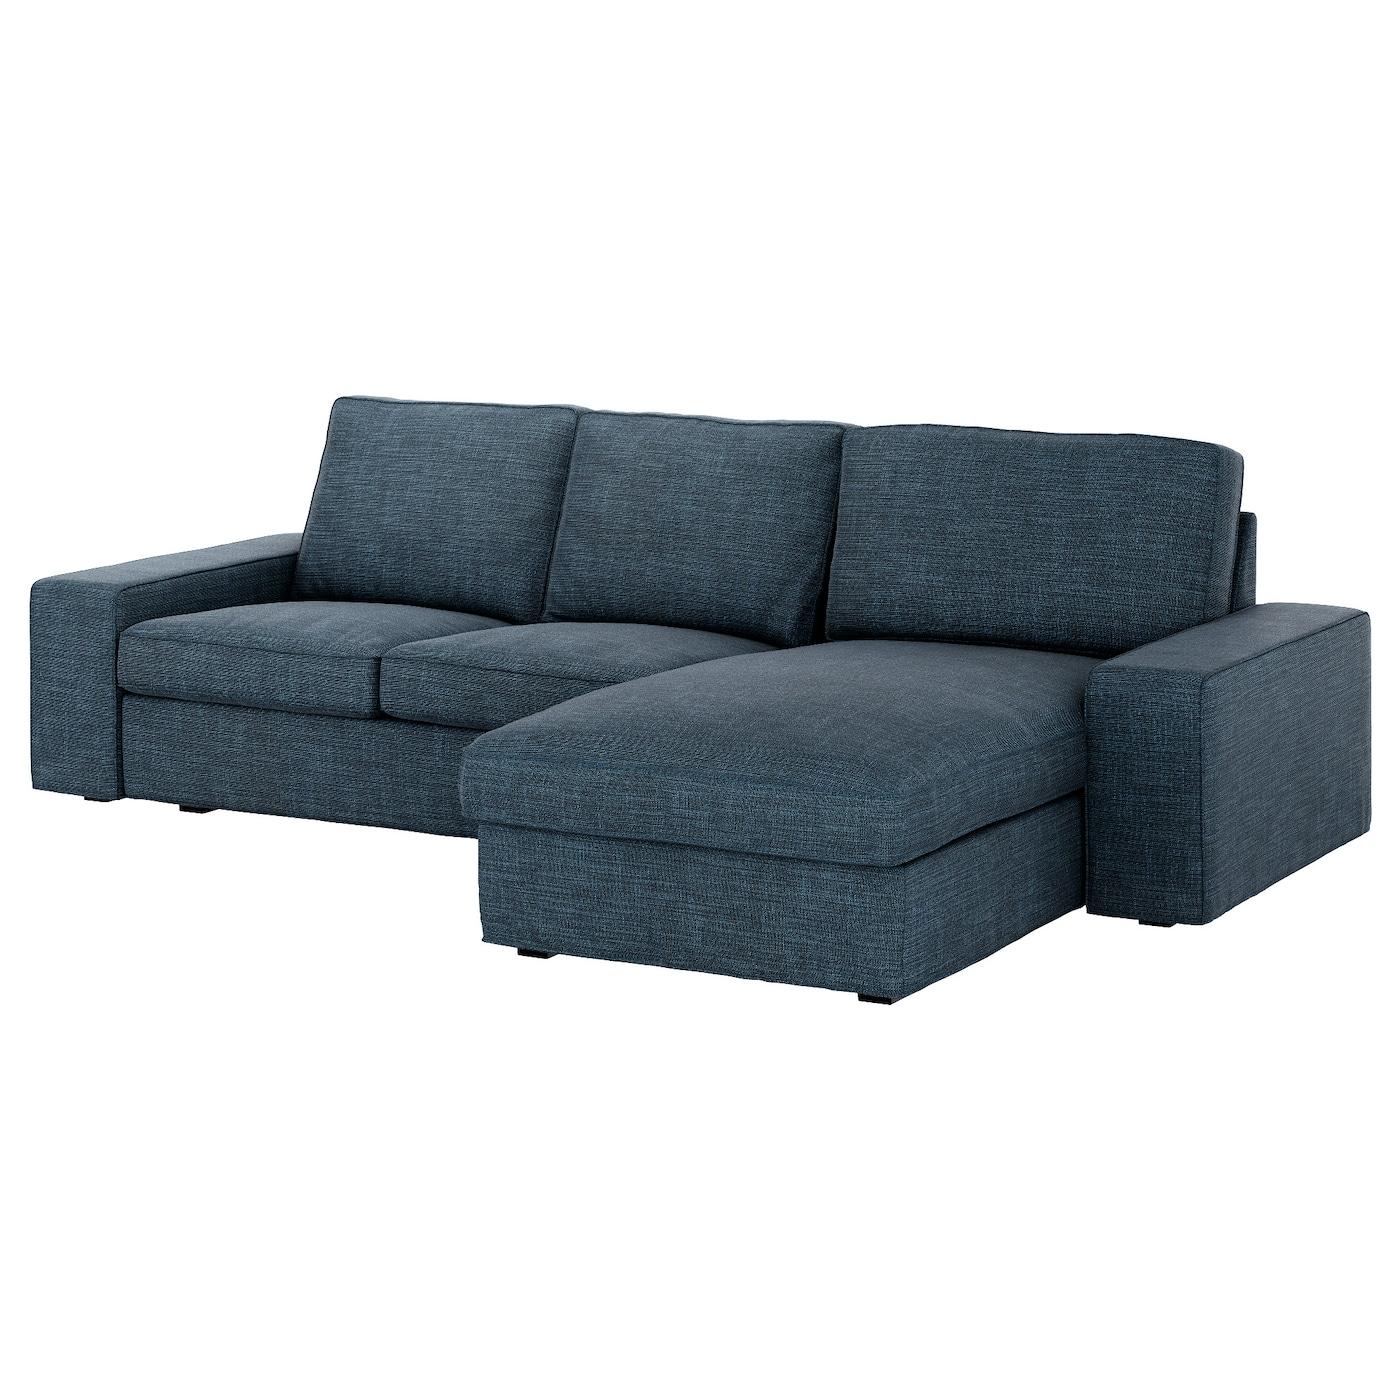 Kivik 3 Seat Sofa With Chaise Longue Hillared Dark Blue Ikea